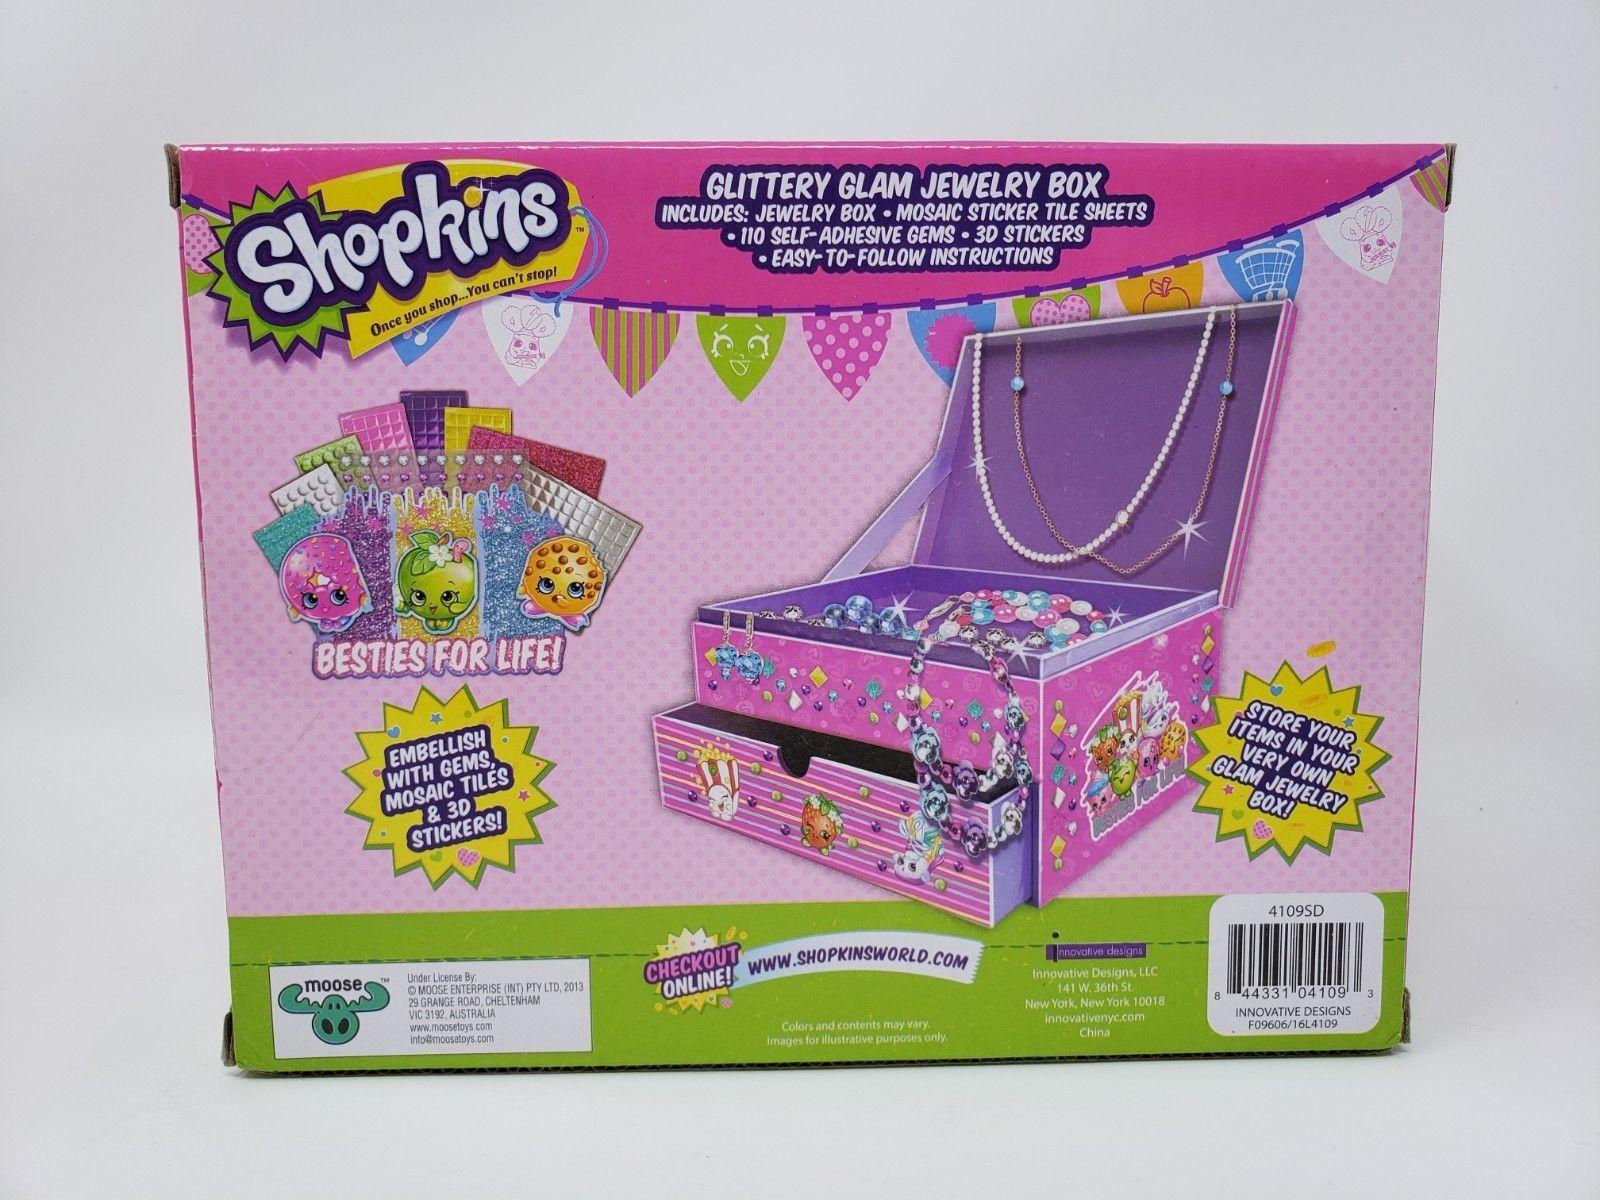 Shopkins Glittery Glam Jewelry Box - New